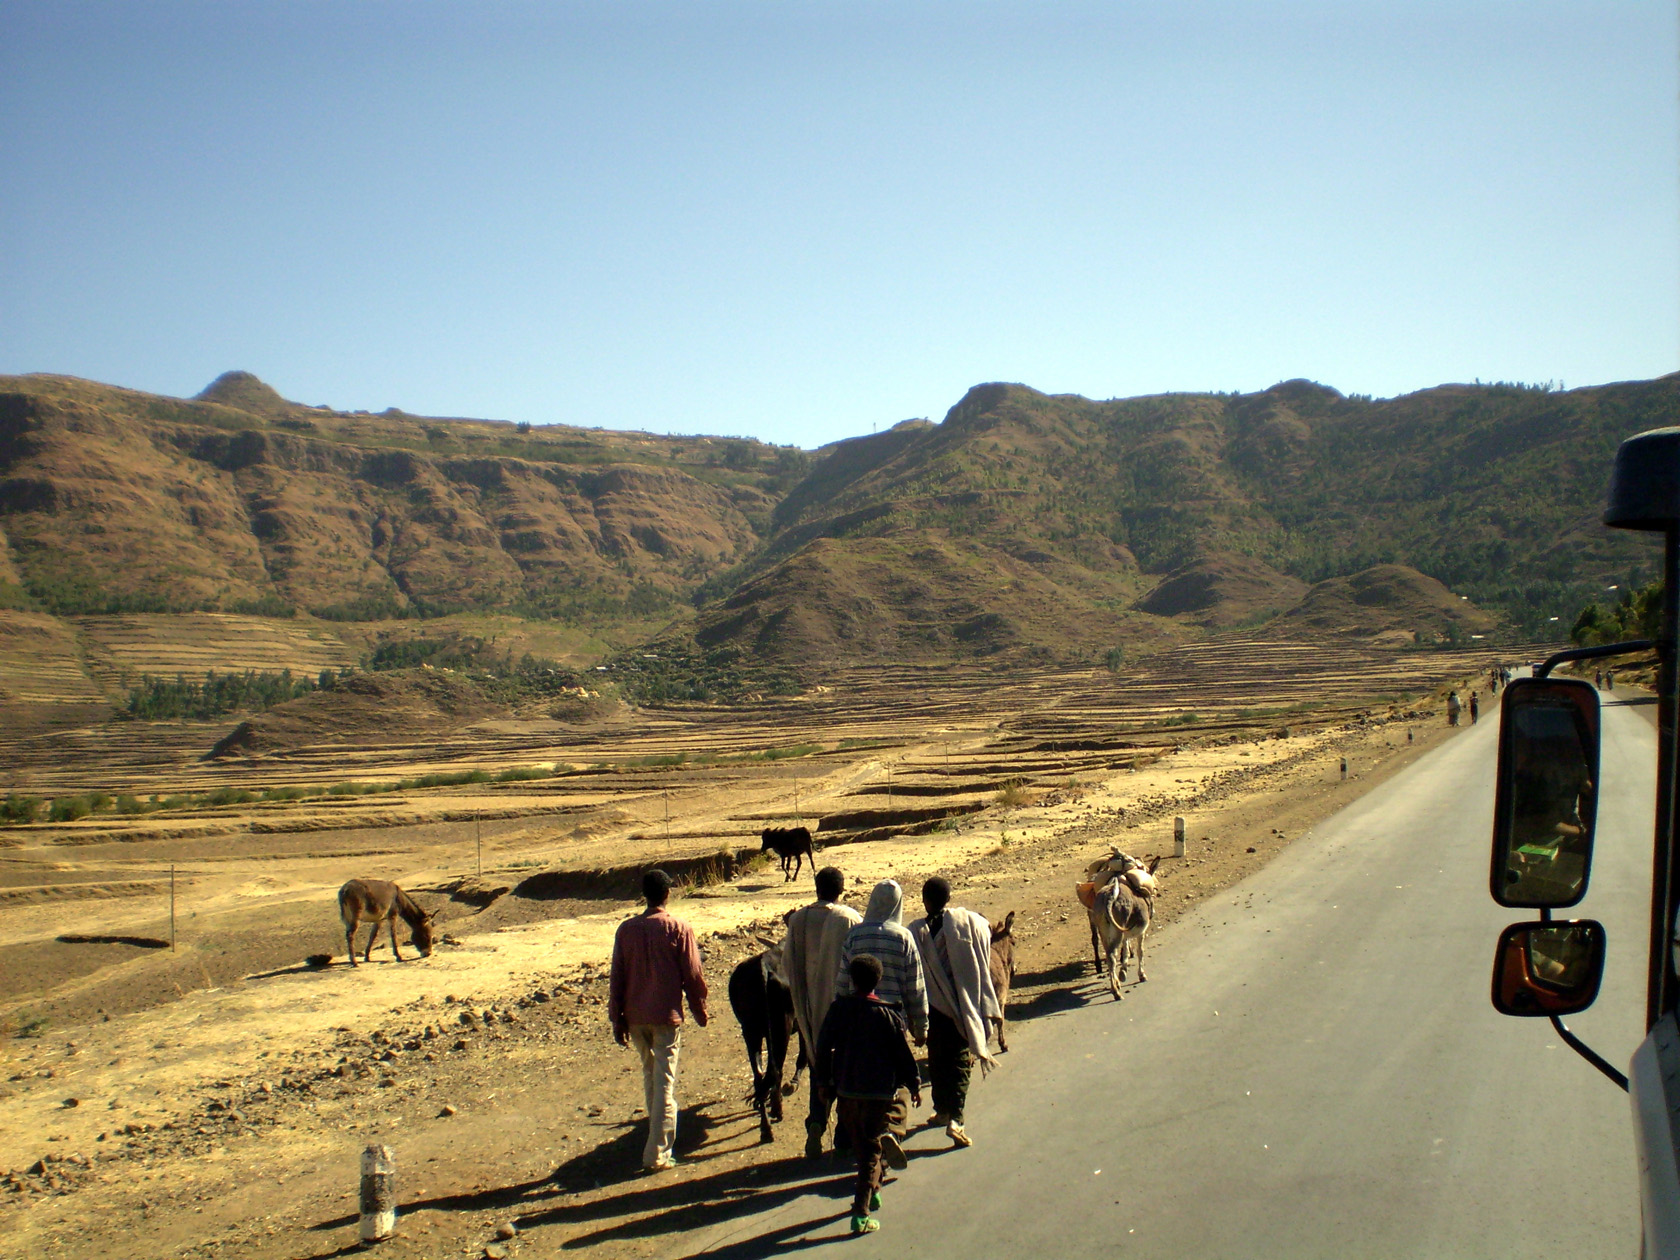 Onderweg in Ethiopië - reizen